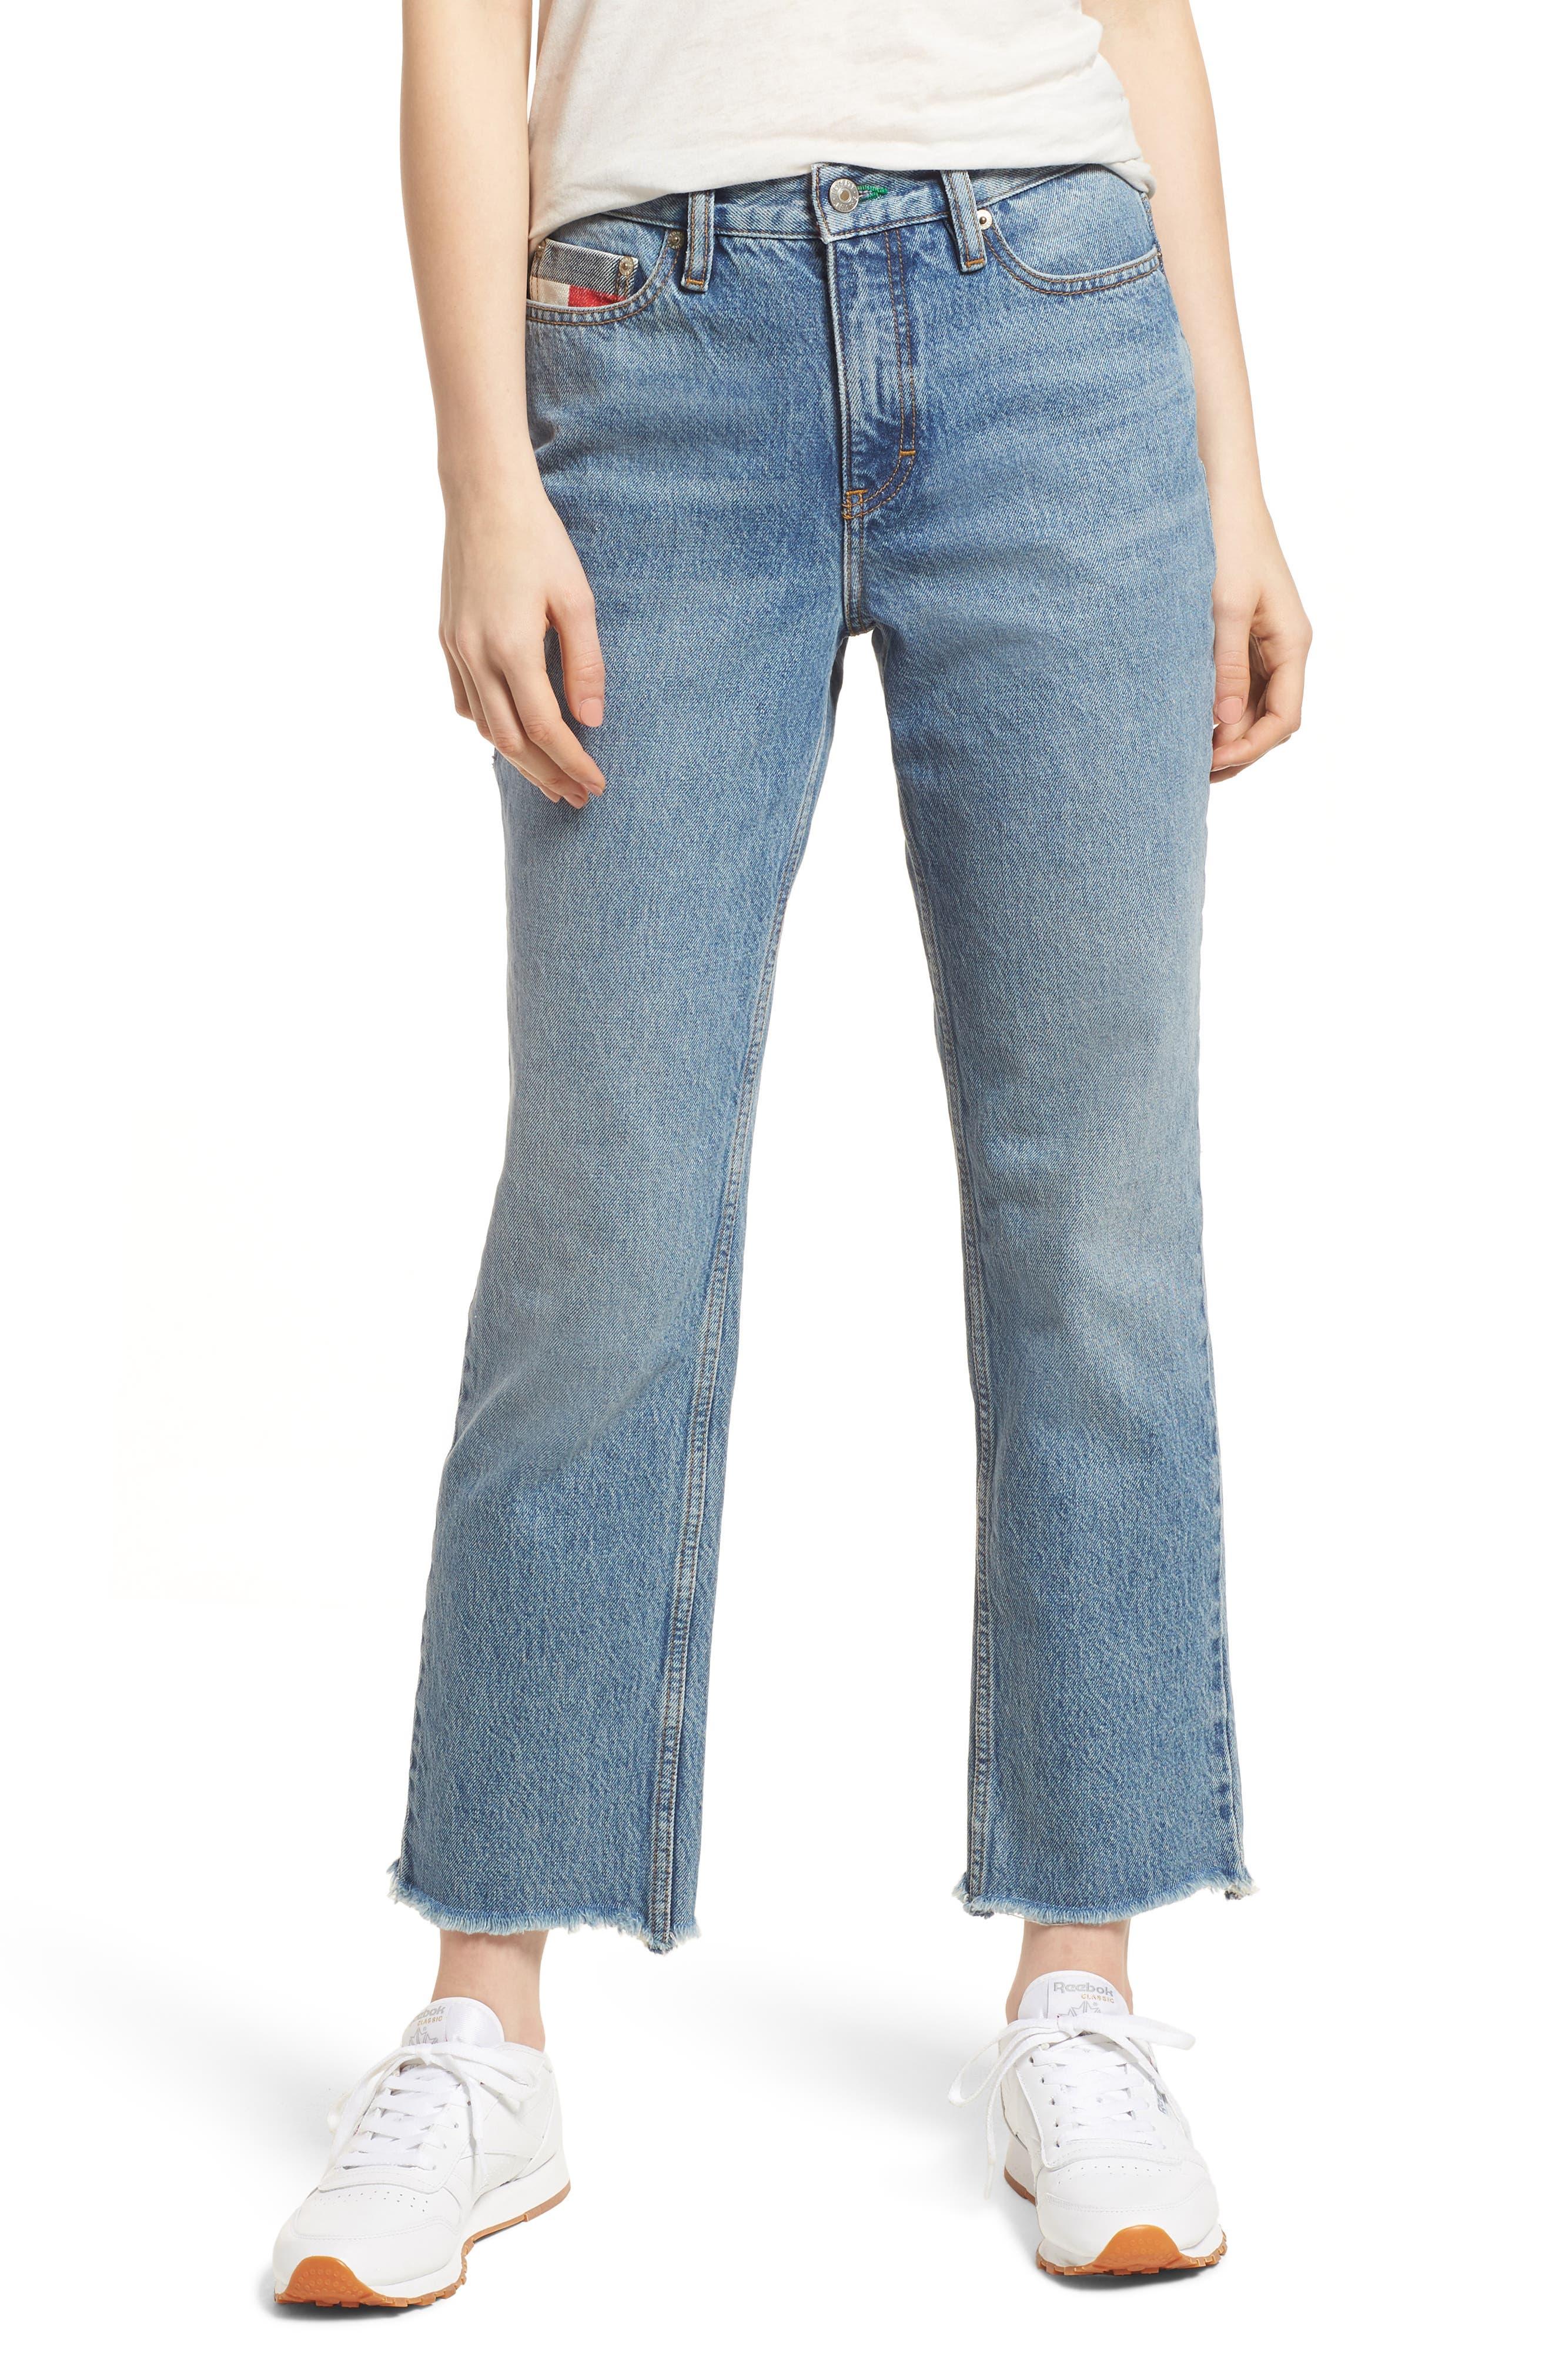 TJW 90s Mom Jeans,                         Main,                         color, Mid Blue Denim